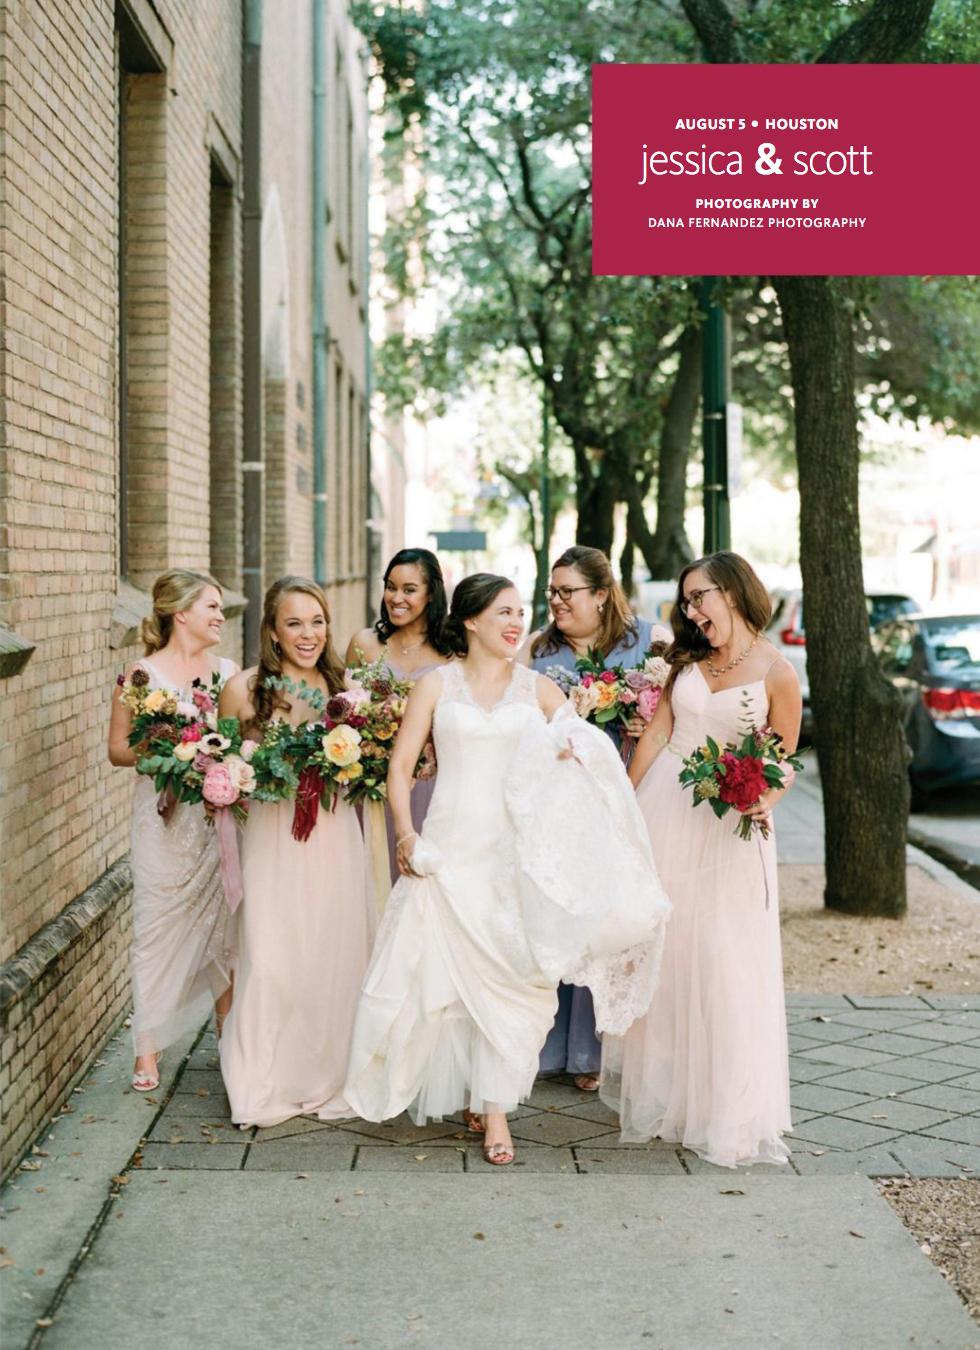 The-Knot-Texas-Fine-Art-Wedding-Film-Destination-Photographer-Houston-Austin-Dallas-New-Orleans-Julia-Ideson-Library-Event-Dana-Josh-Fernandez-Photograph-Top-Best-131.png